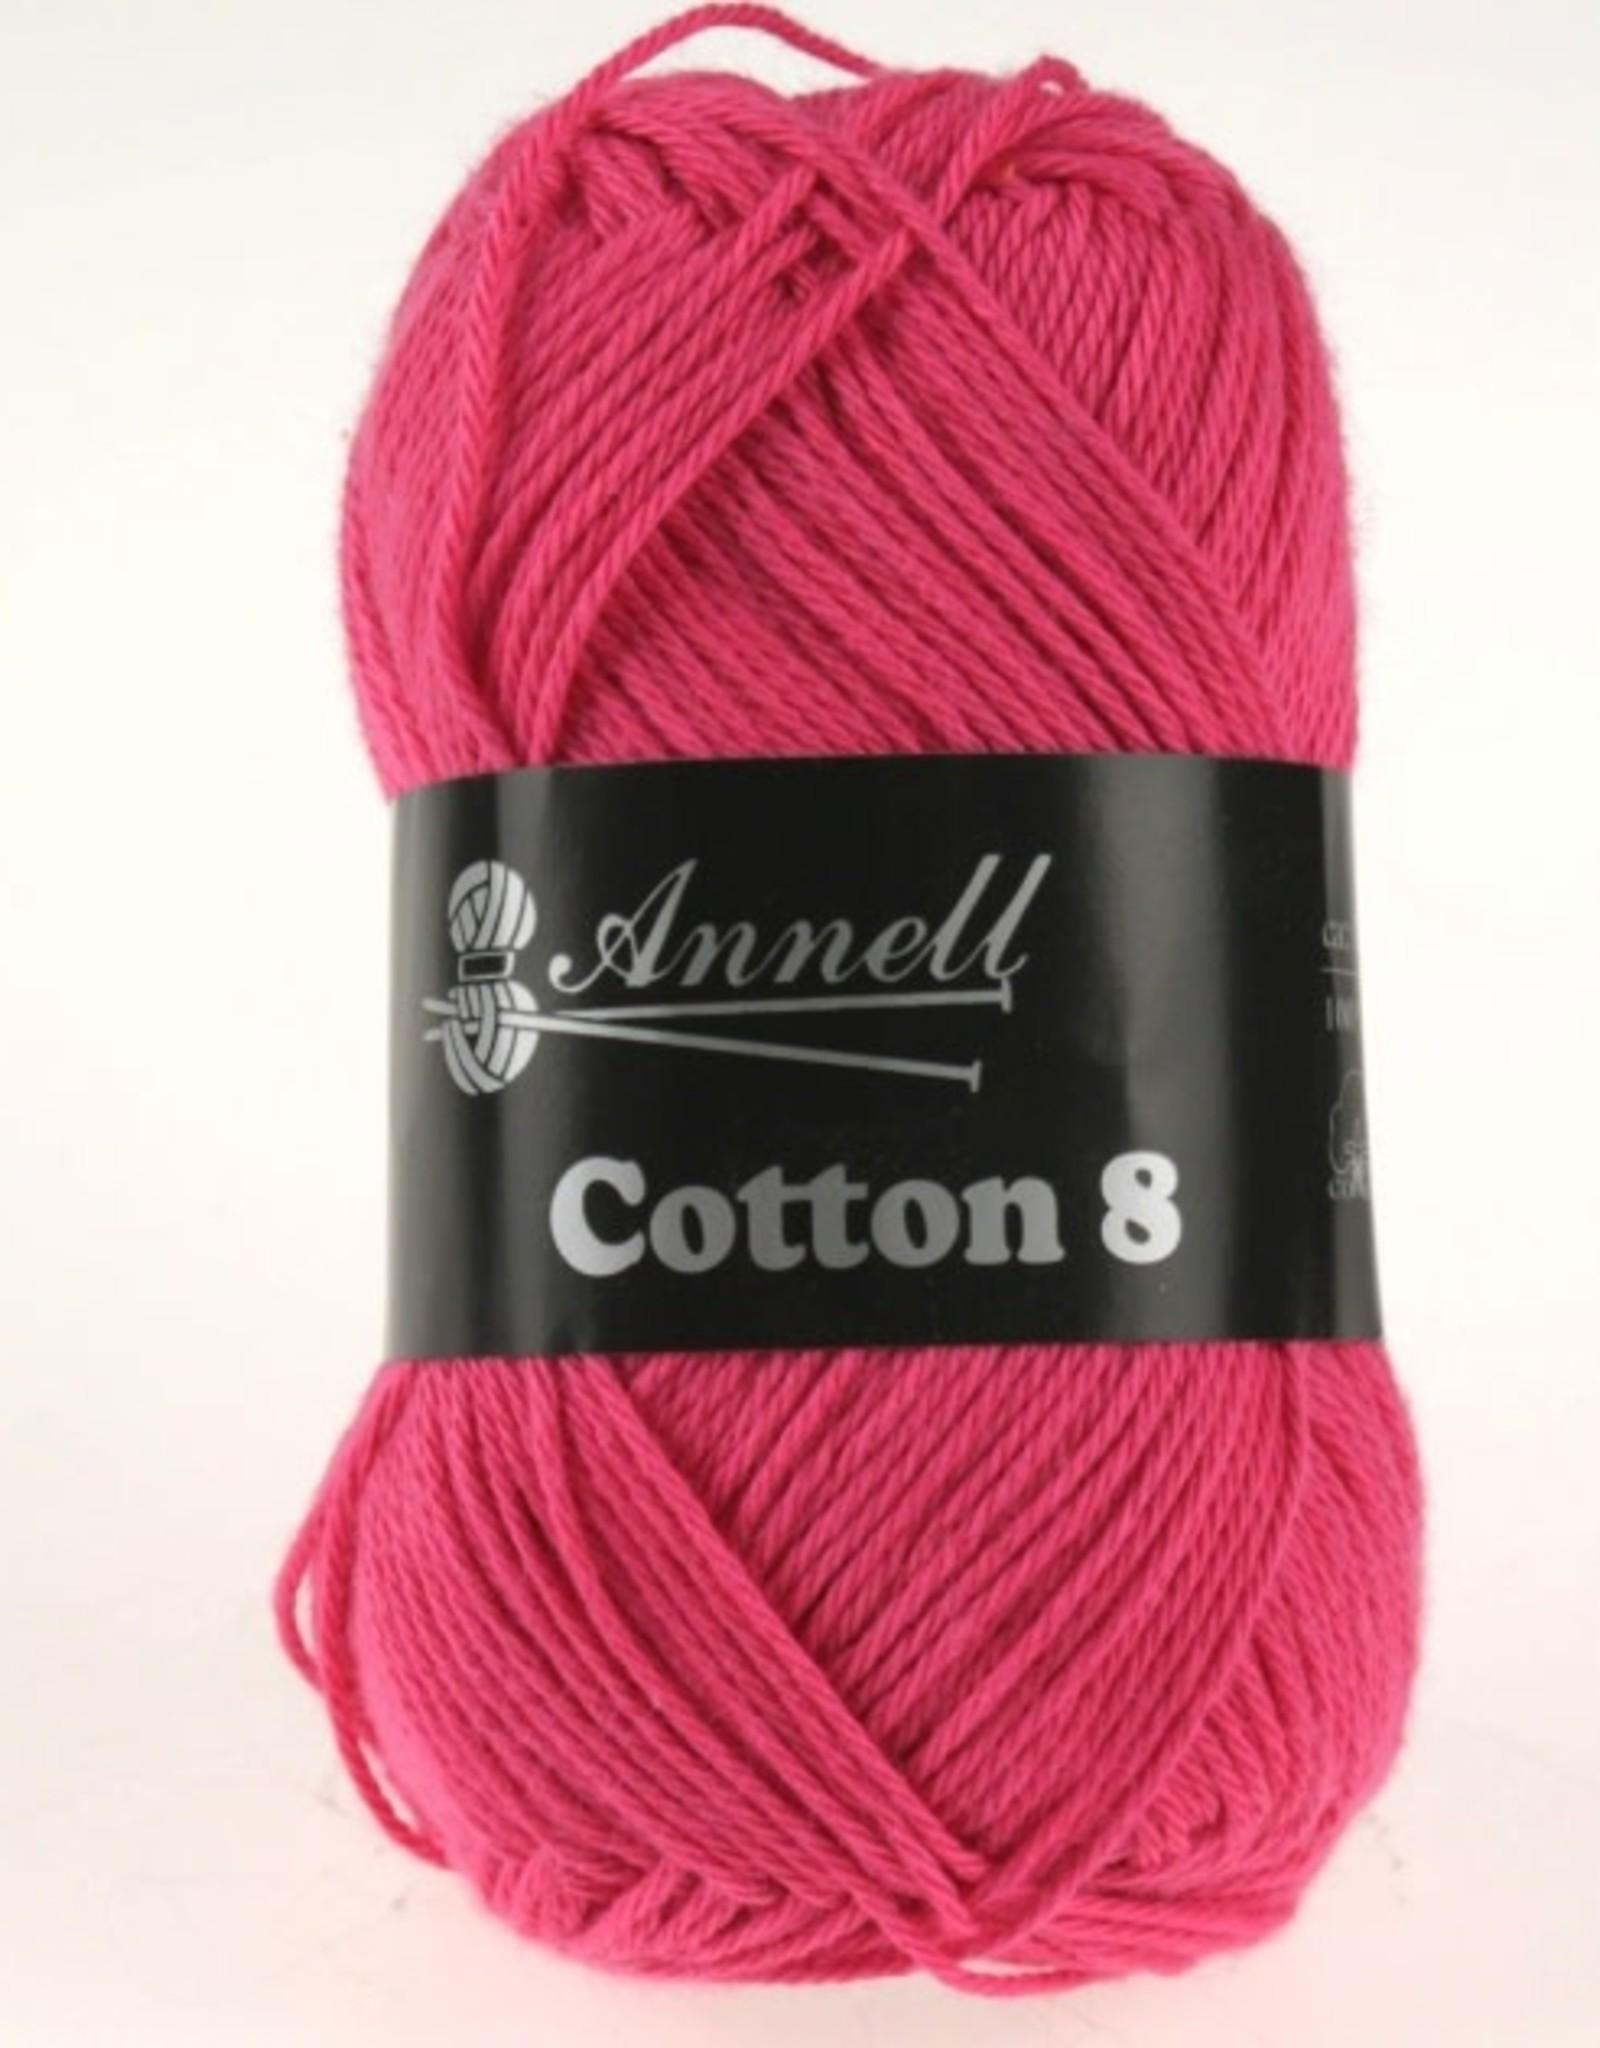 Annell Annell Cotton 8 77